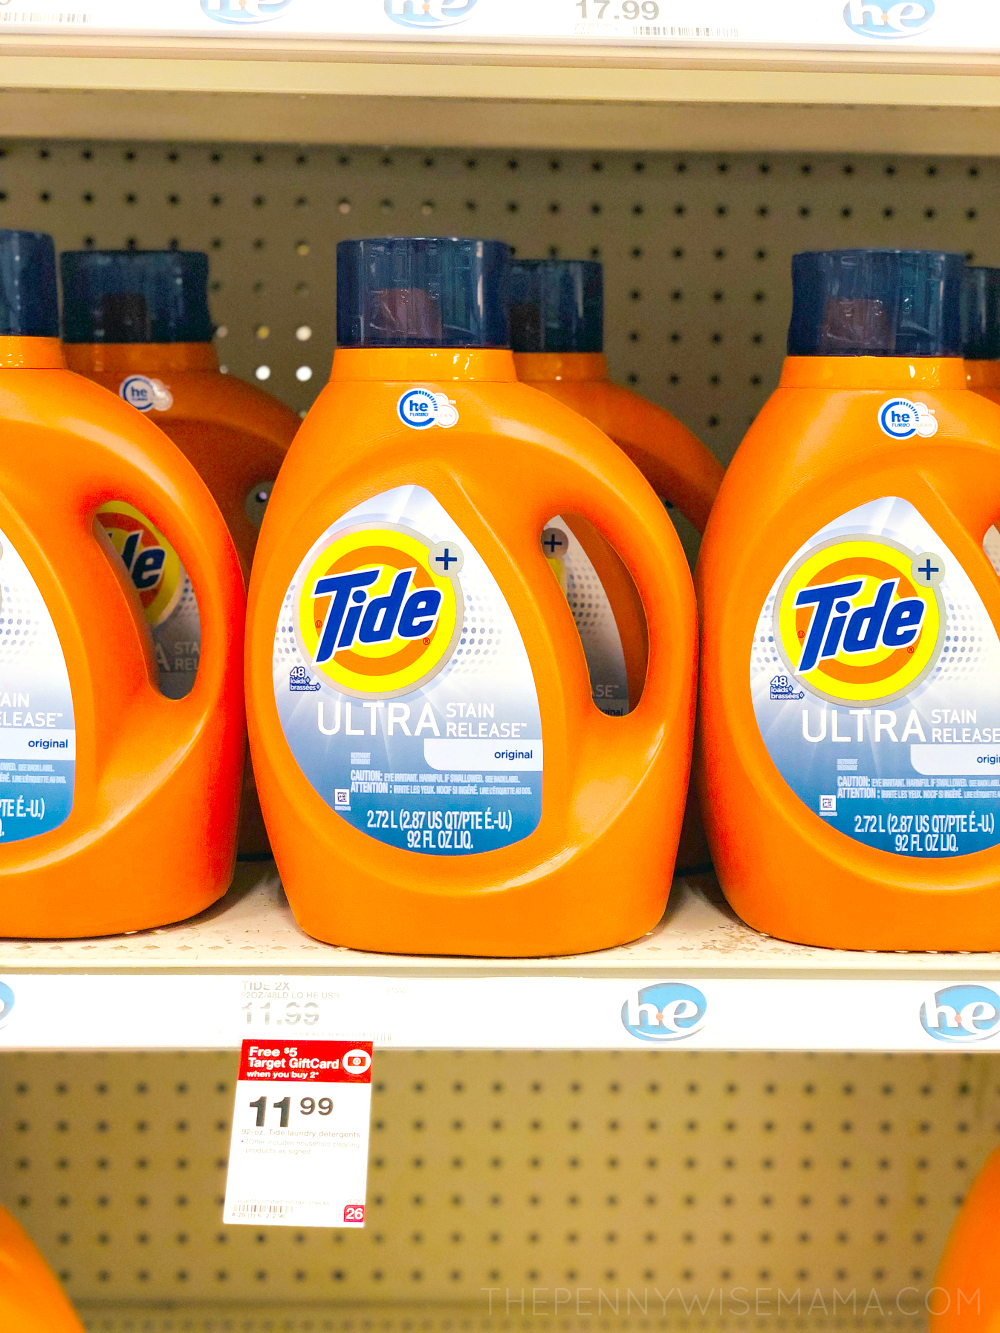 Tide Liquid Detergent Coupon - Save at Target